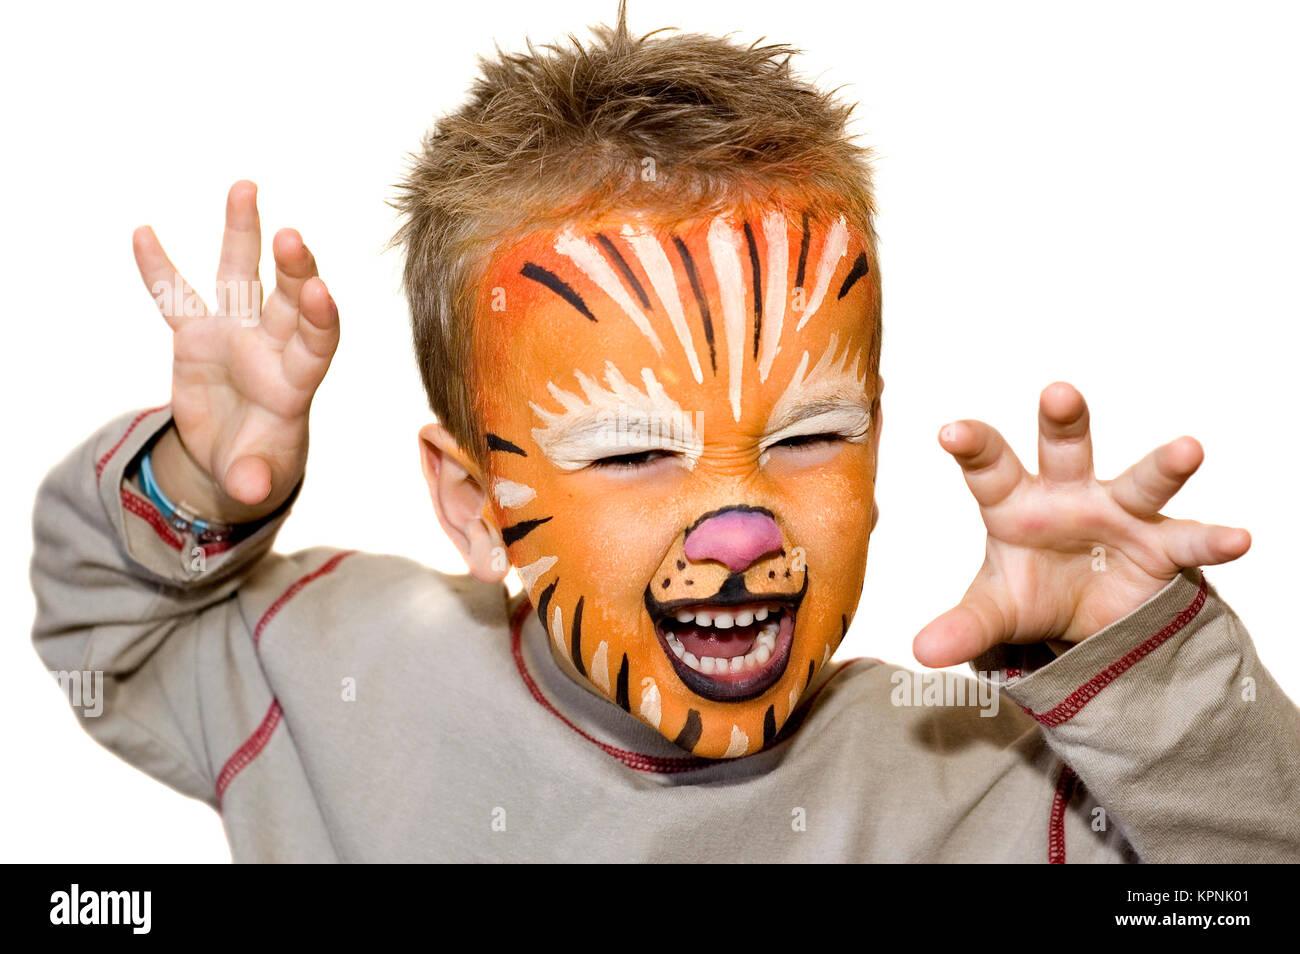 León enojado Foto de stock